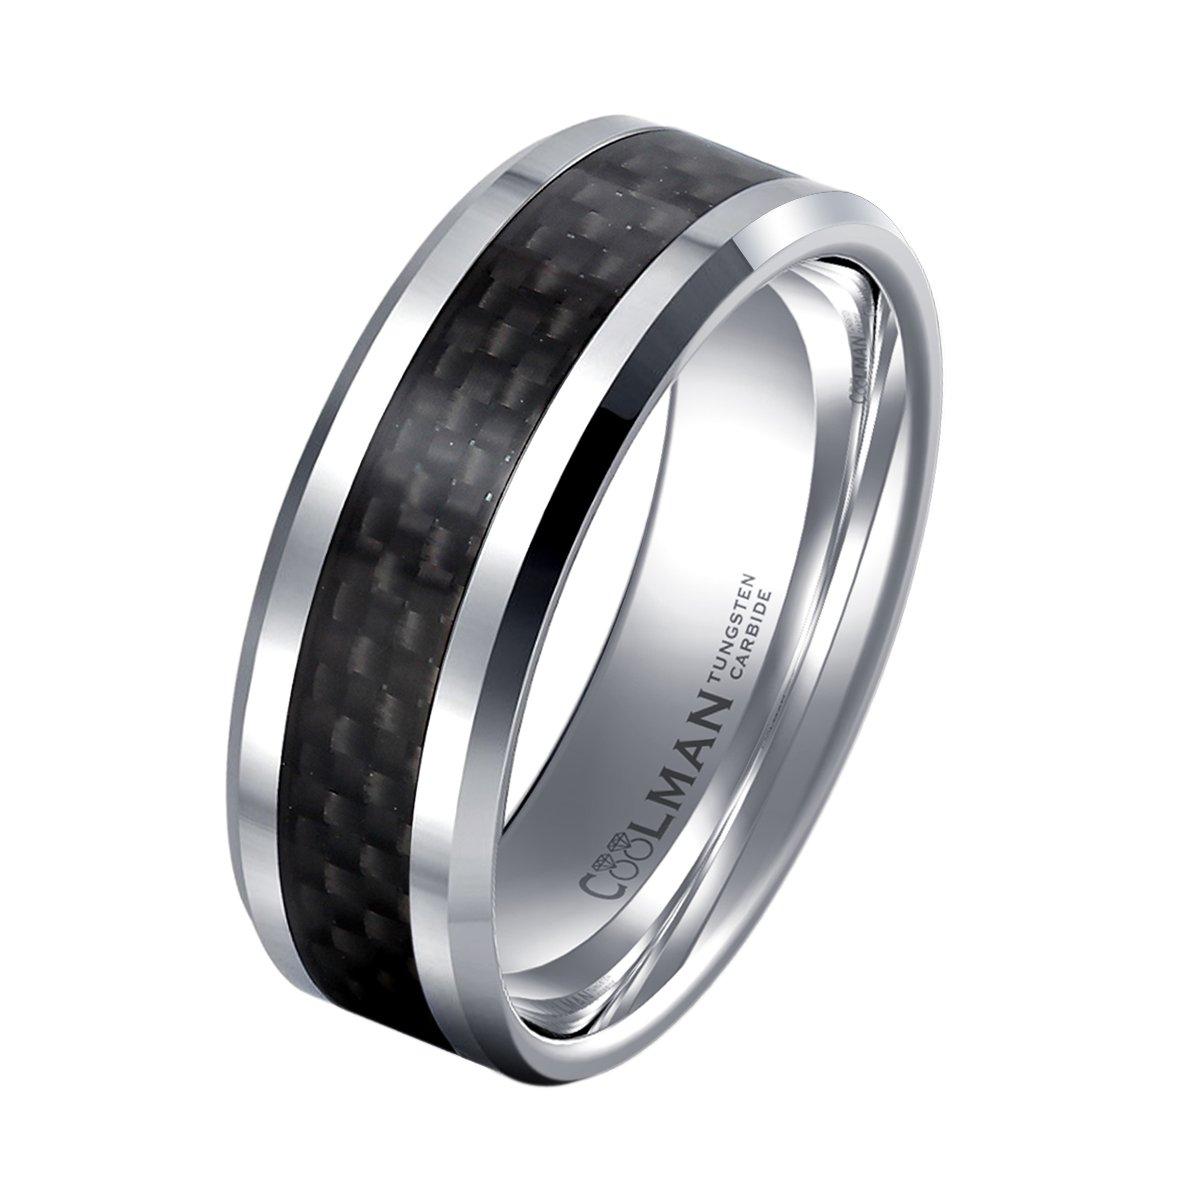 Tungsten Wedding Rings.Coolman Tungsten Wedding Rings For Men Black Carbon Fiber Inlaid Men S Rings 8mm Comfort Fit Ring